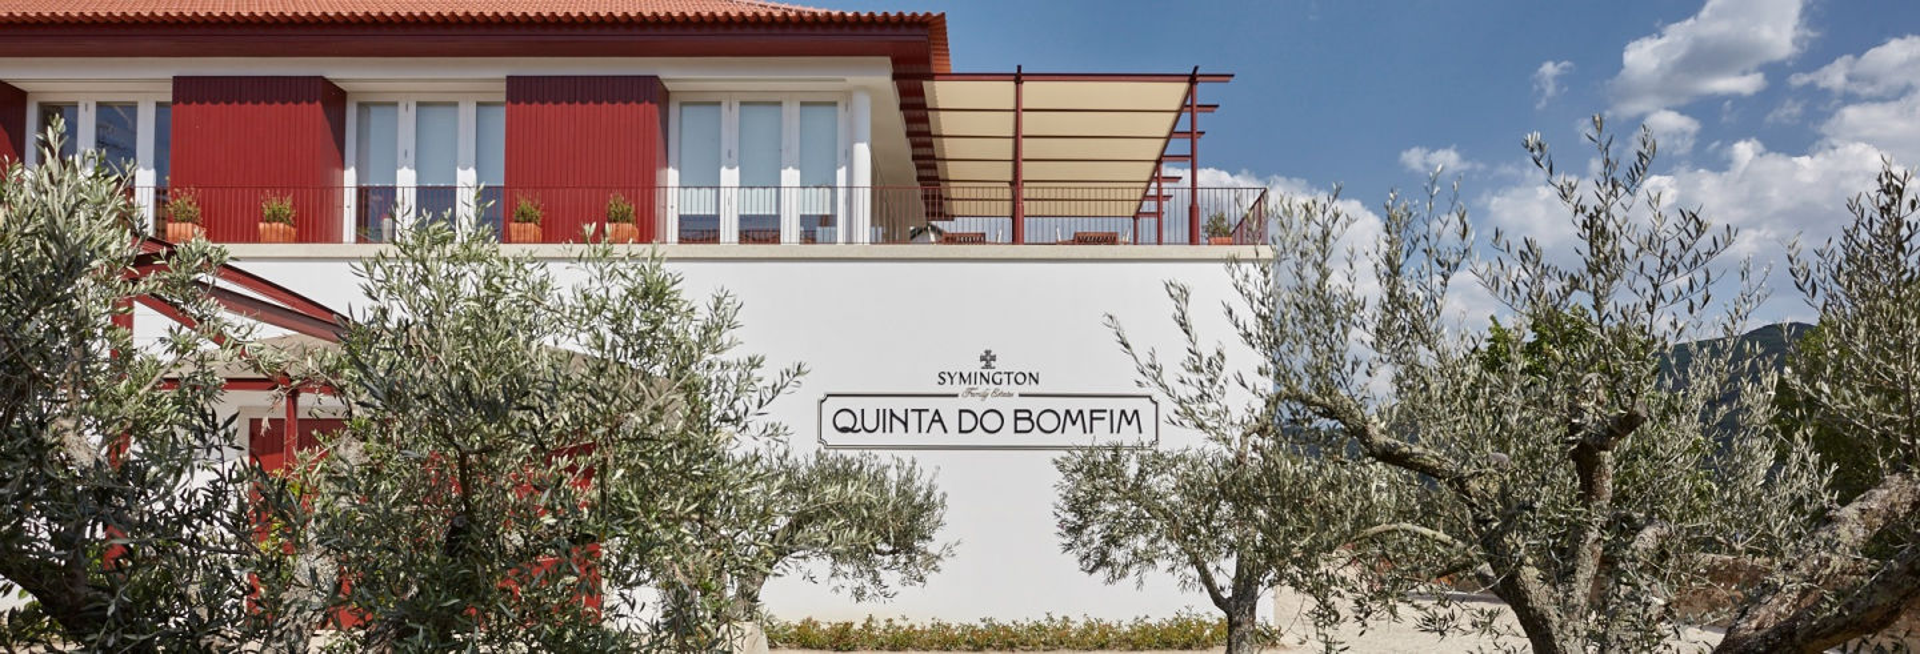 Visita a la bodega Quinta do Bomfim